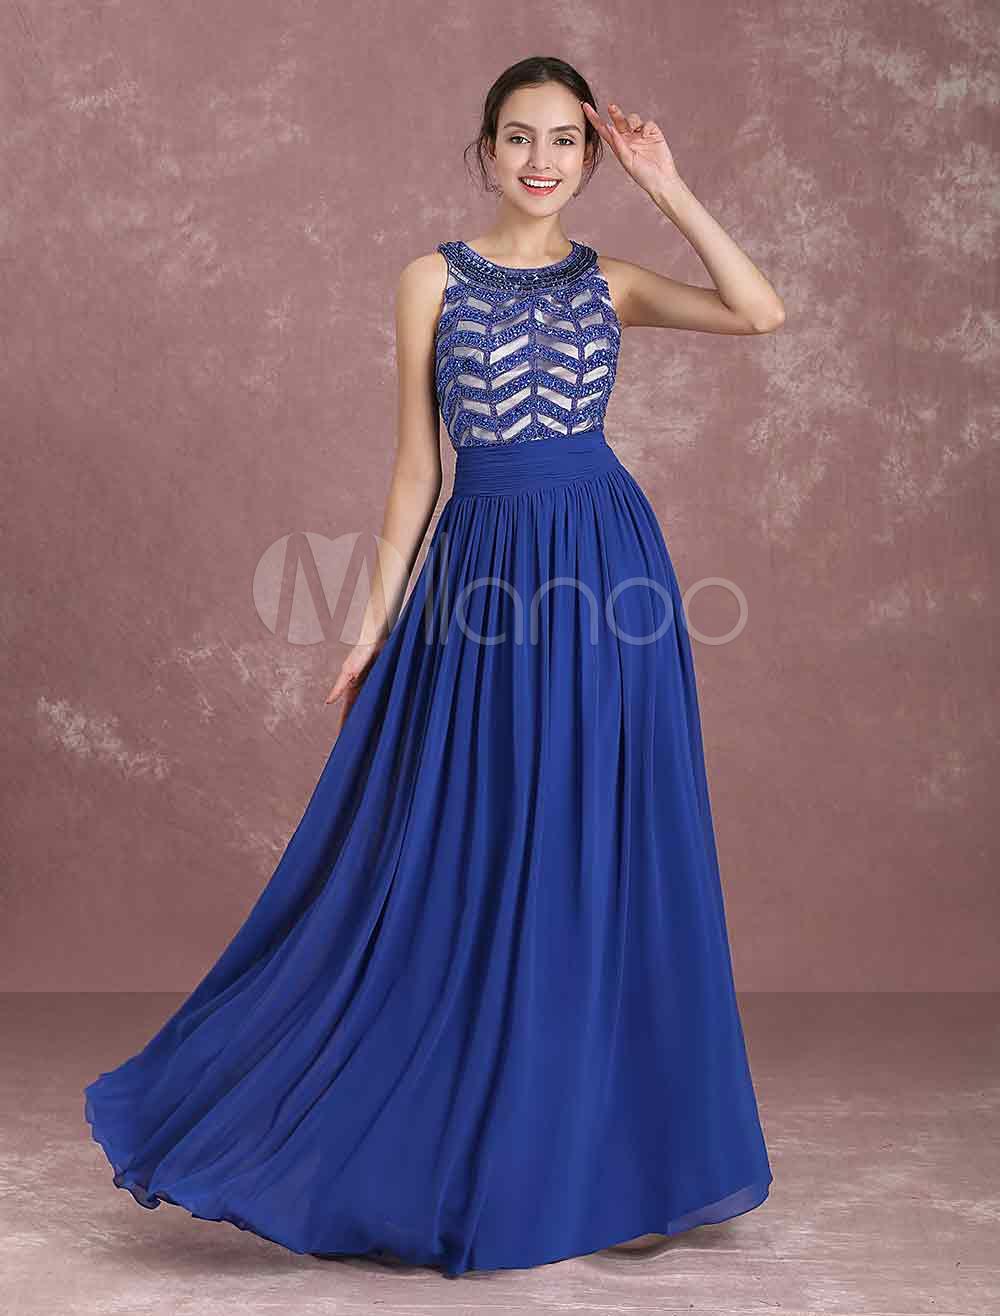 Chiffon Evening Dresses Royal Blue Beading Occasion Dresses Jewel Sleeveless Floor Length Party Dress (Wedding) photo